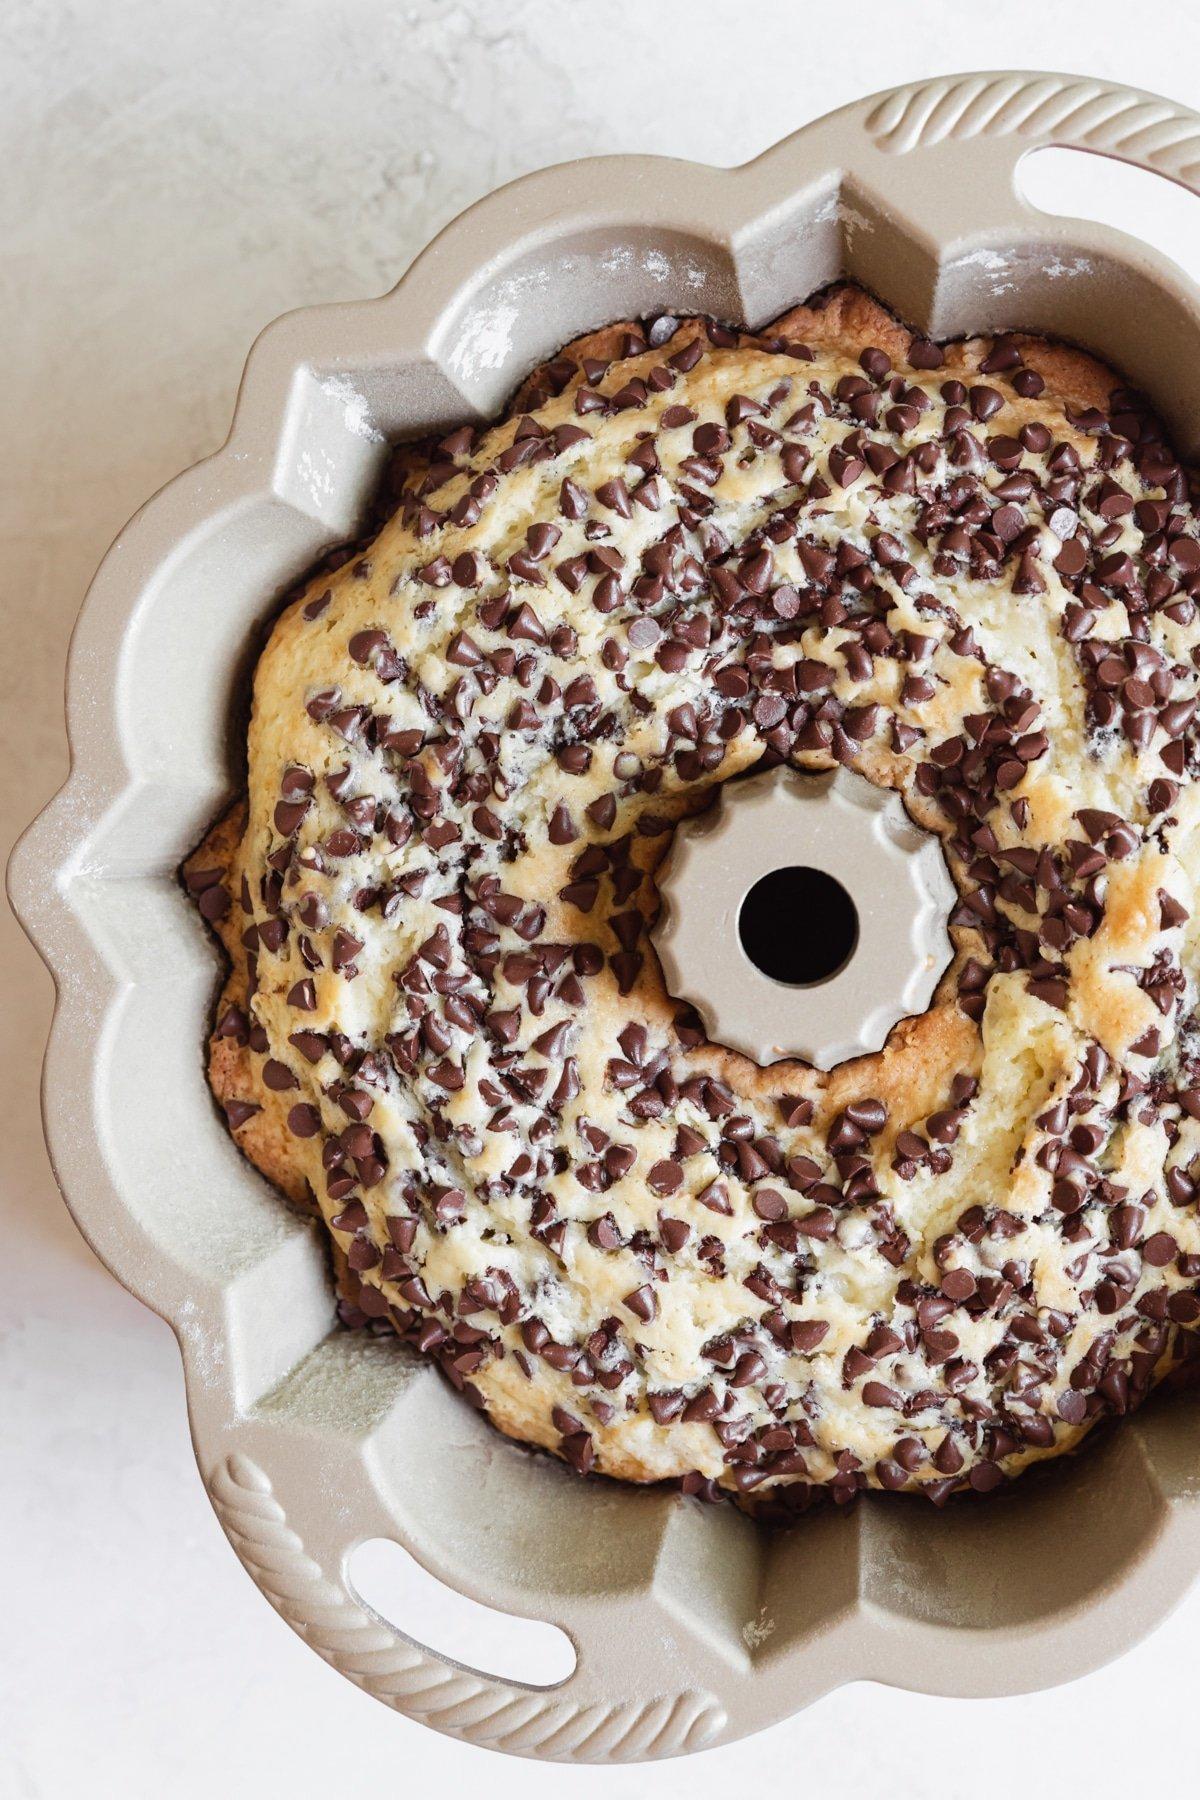 chocolate chip bundt cake in a bundt pan